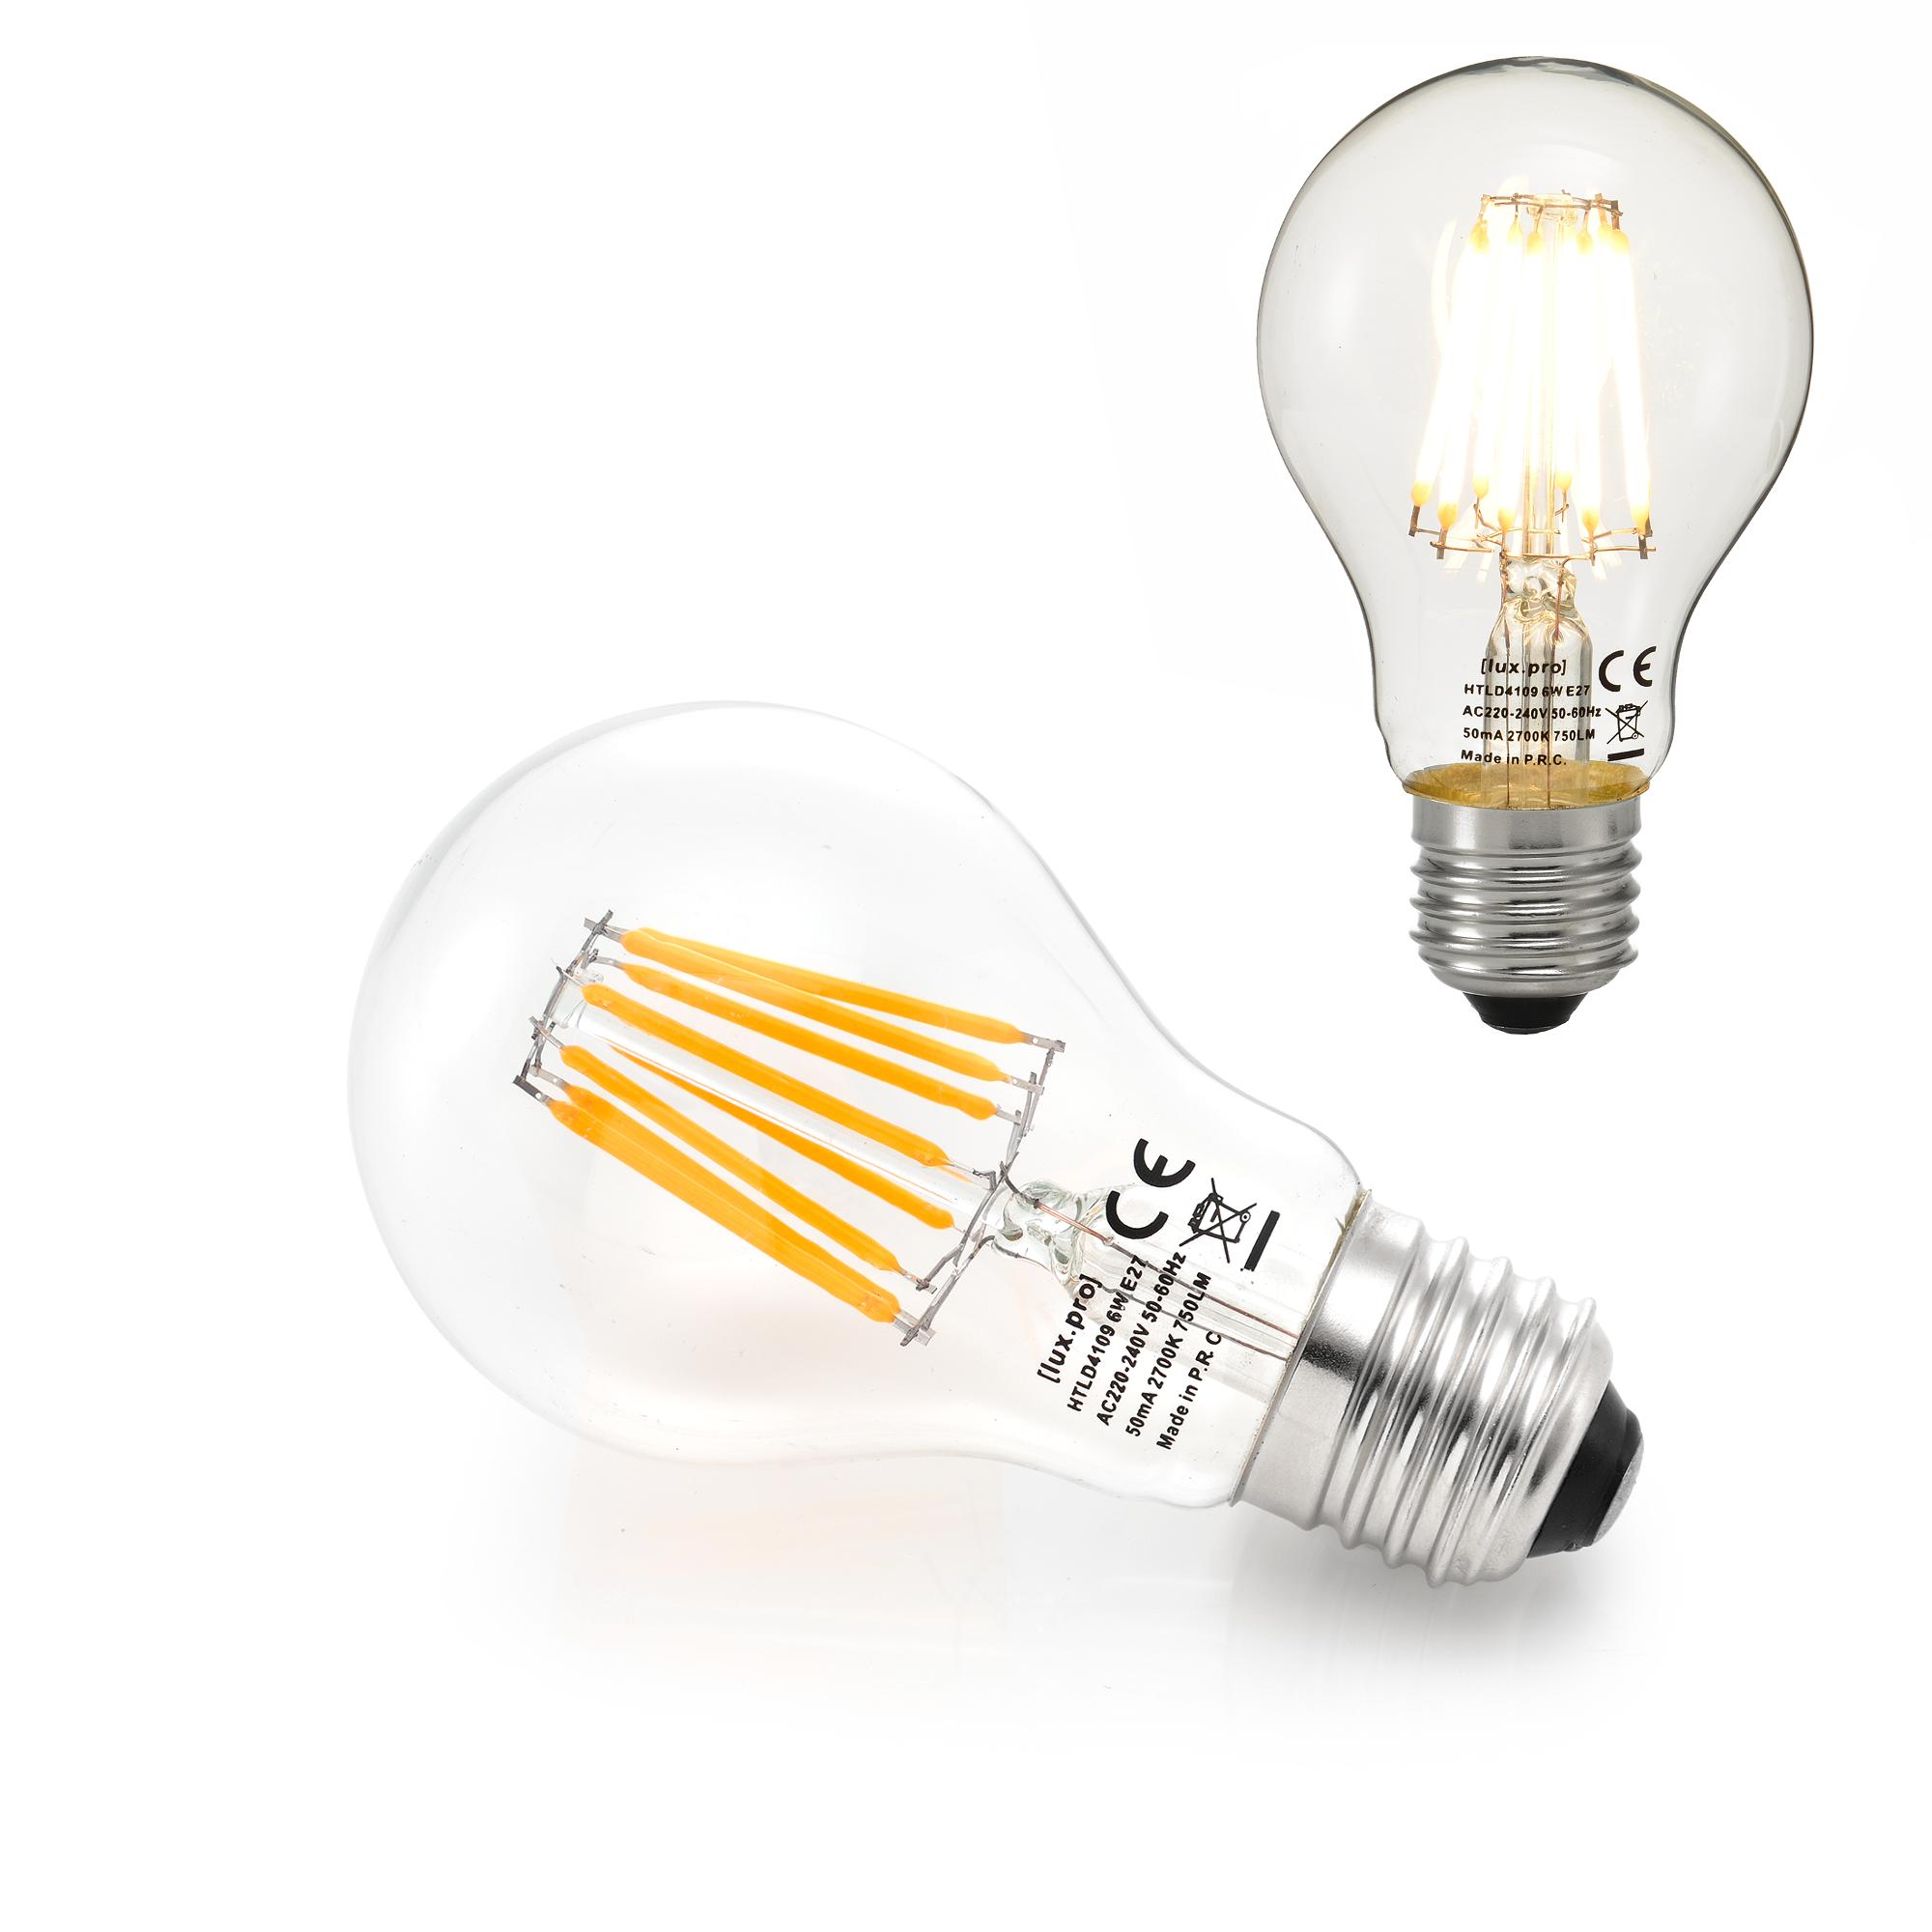 10x led e27 warmwei lampe filament 6w 750lm. Black Bedroom Furniture Sets. Home Design Ideas